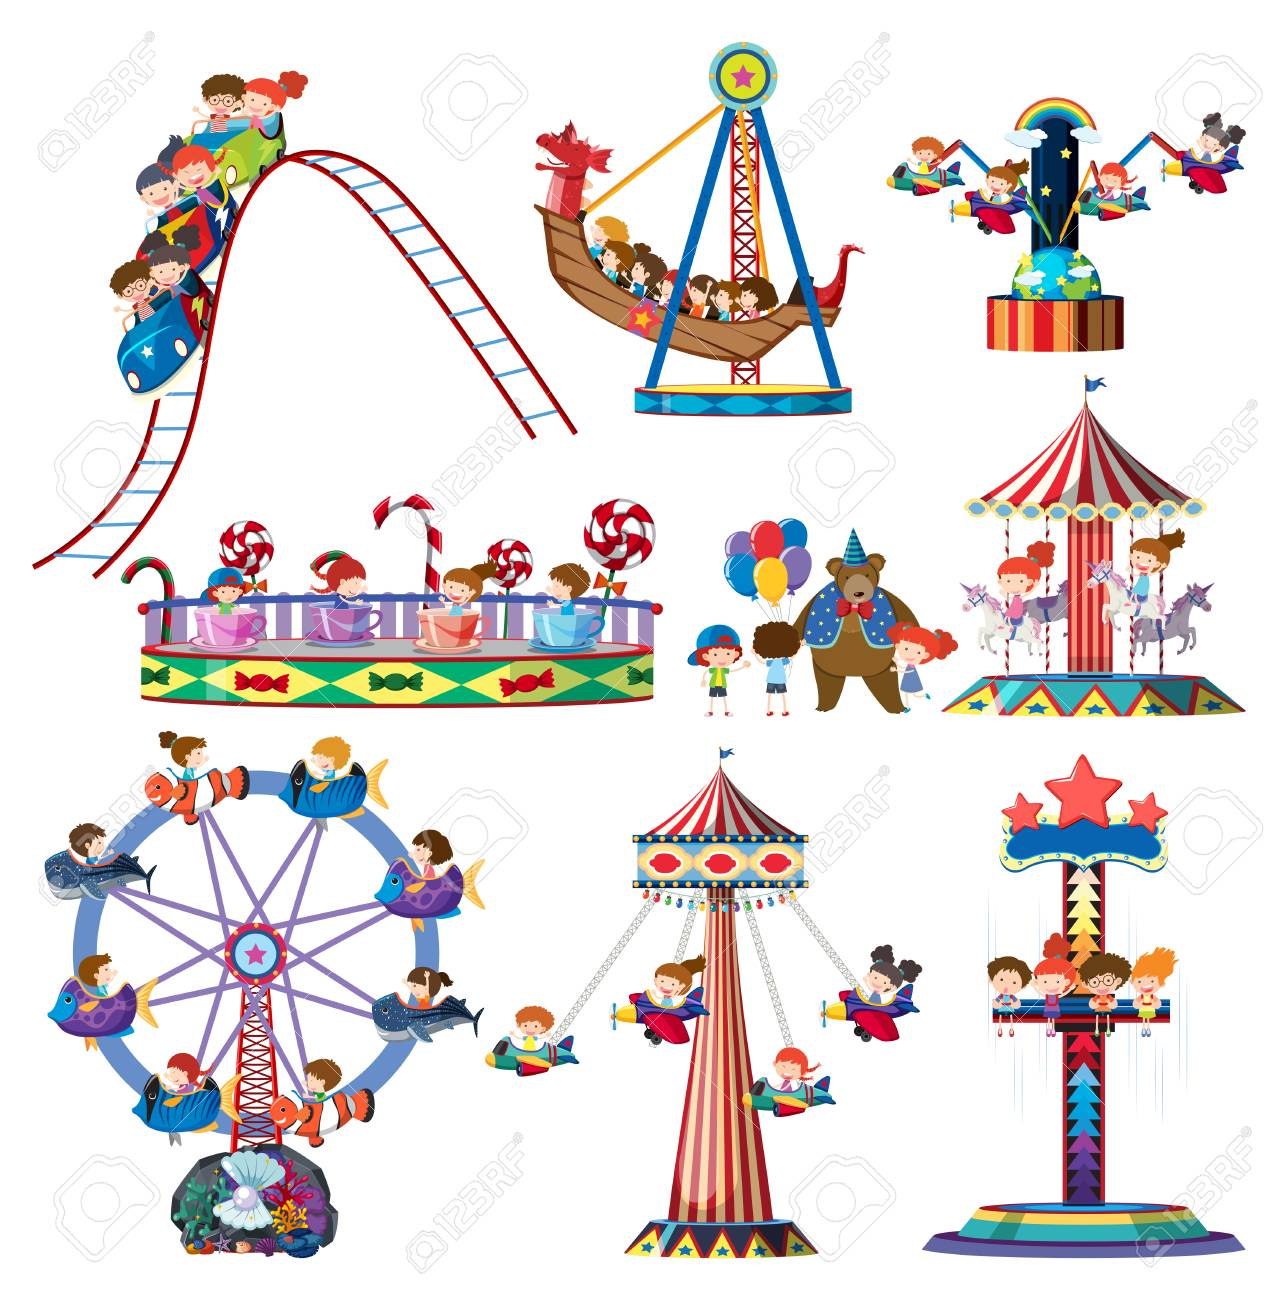 A set of theme park rides illustration - 104709684